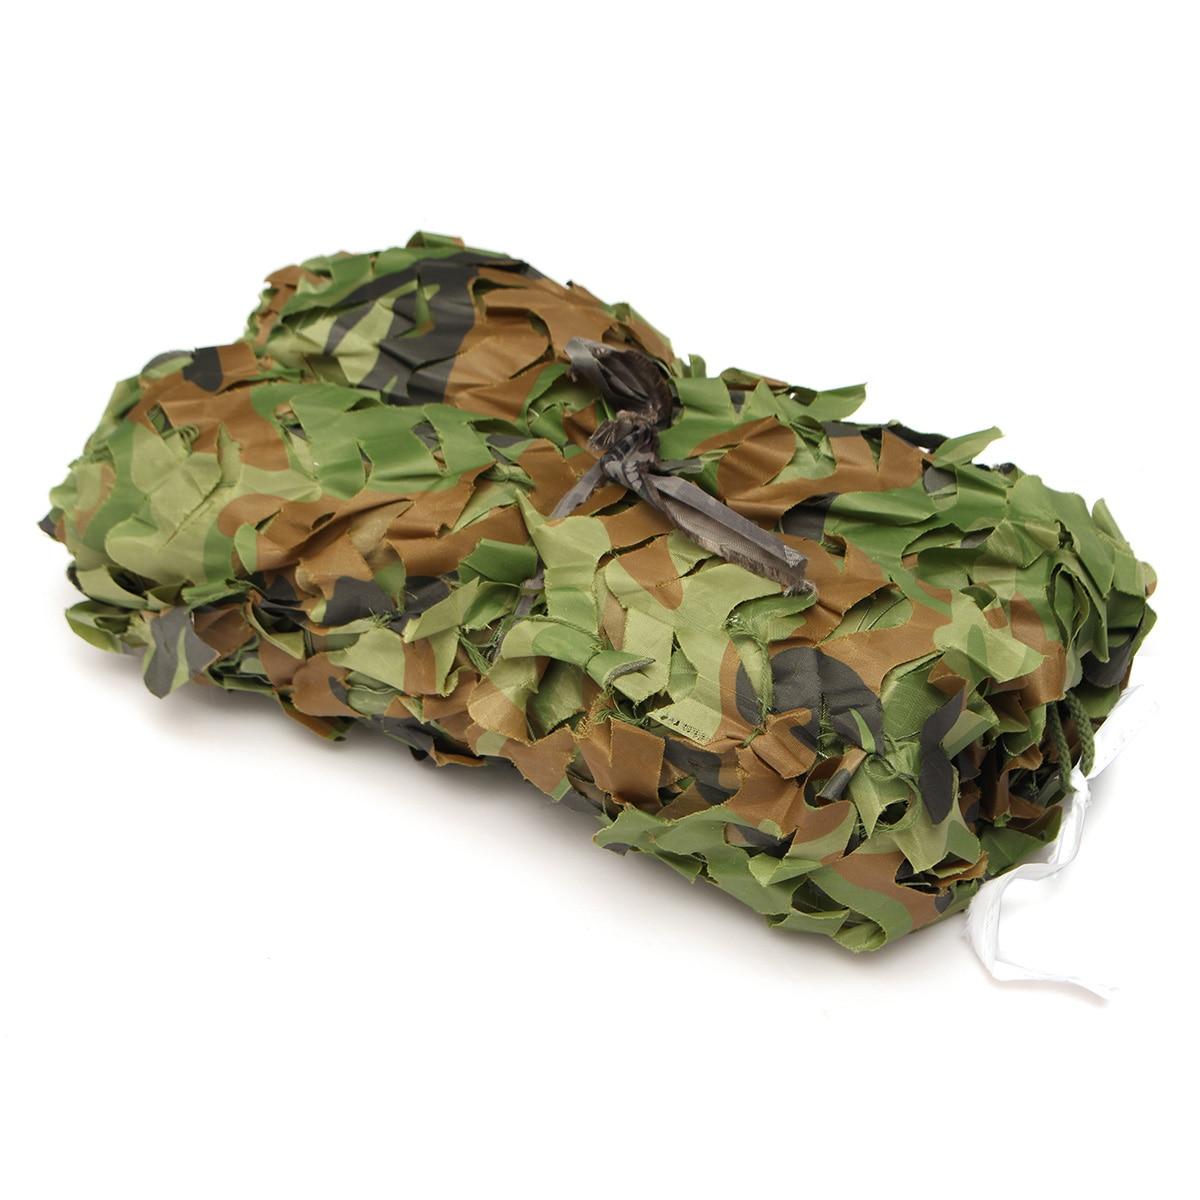 Vintage NOS North camouflage polypropylene utility or bug suit Woodland camo